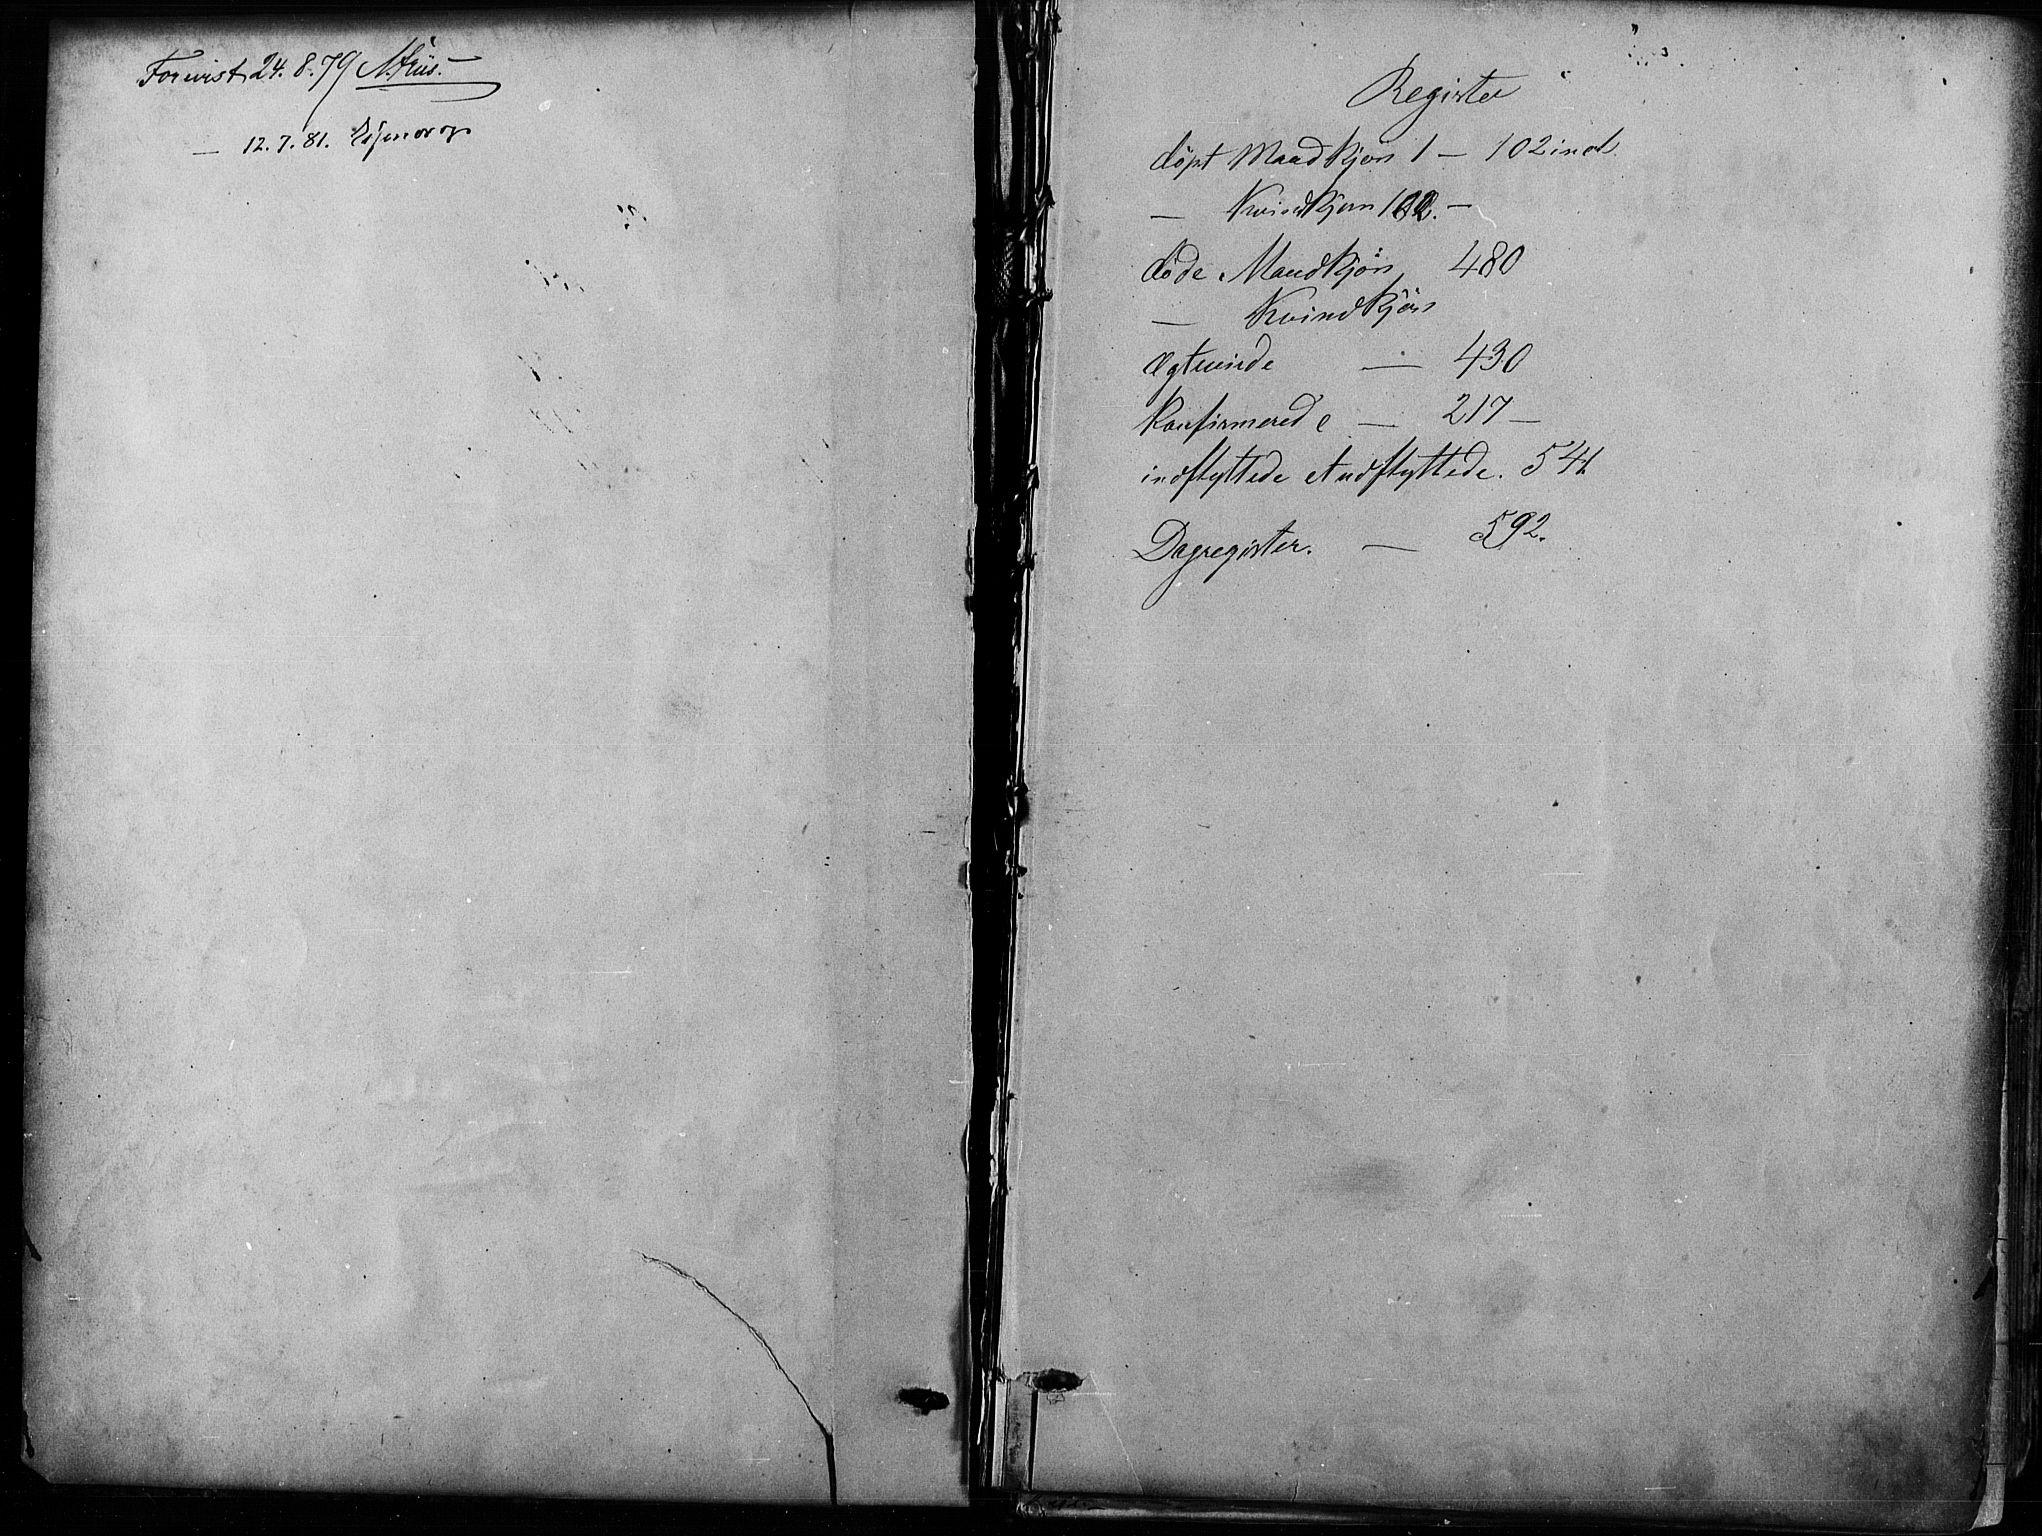 SAO, Nes prestekontor Kirkebøker, F/Fa/L0009: Ministerialbok nr. I 9, 1875-1882